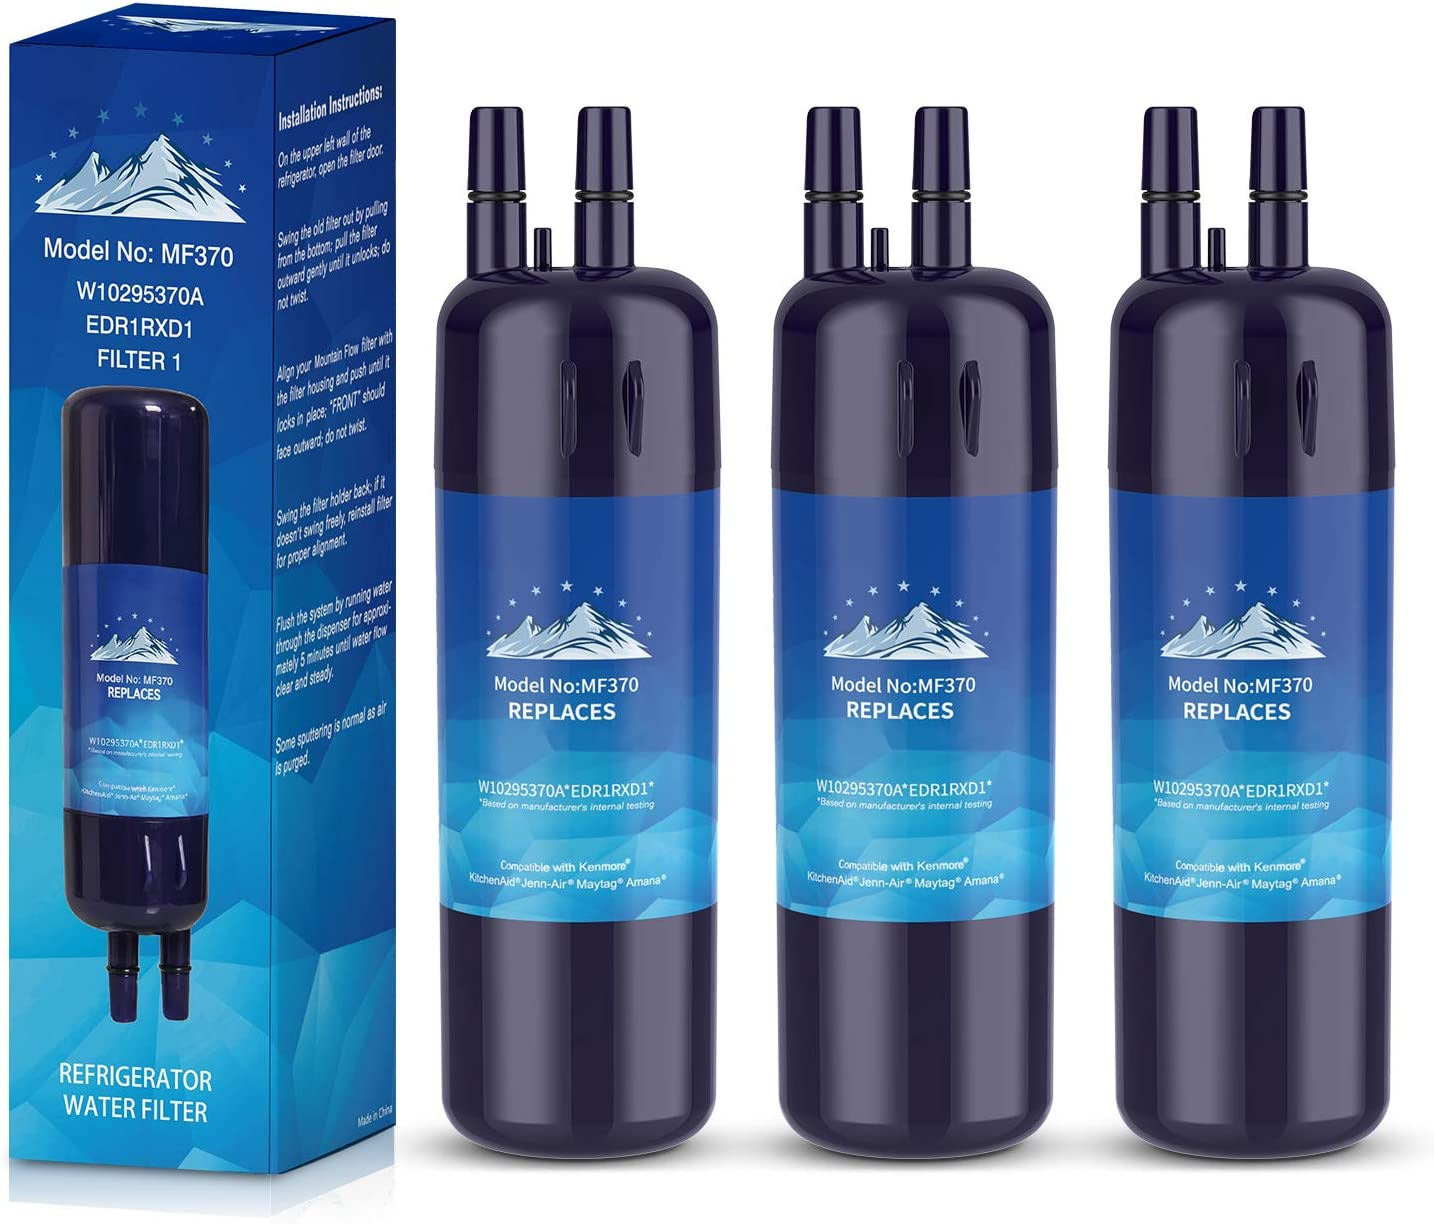 W10295370A Water Filter Cap Compatible with W10295370,P4RFWB,EDR1RXD1,P8RFWB2L,Pur Filter 1 Kenmore 46-9930 Kenmore 46-9081,3 Pack